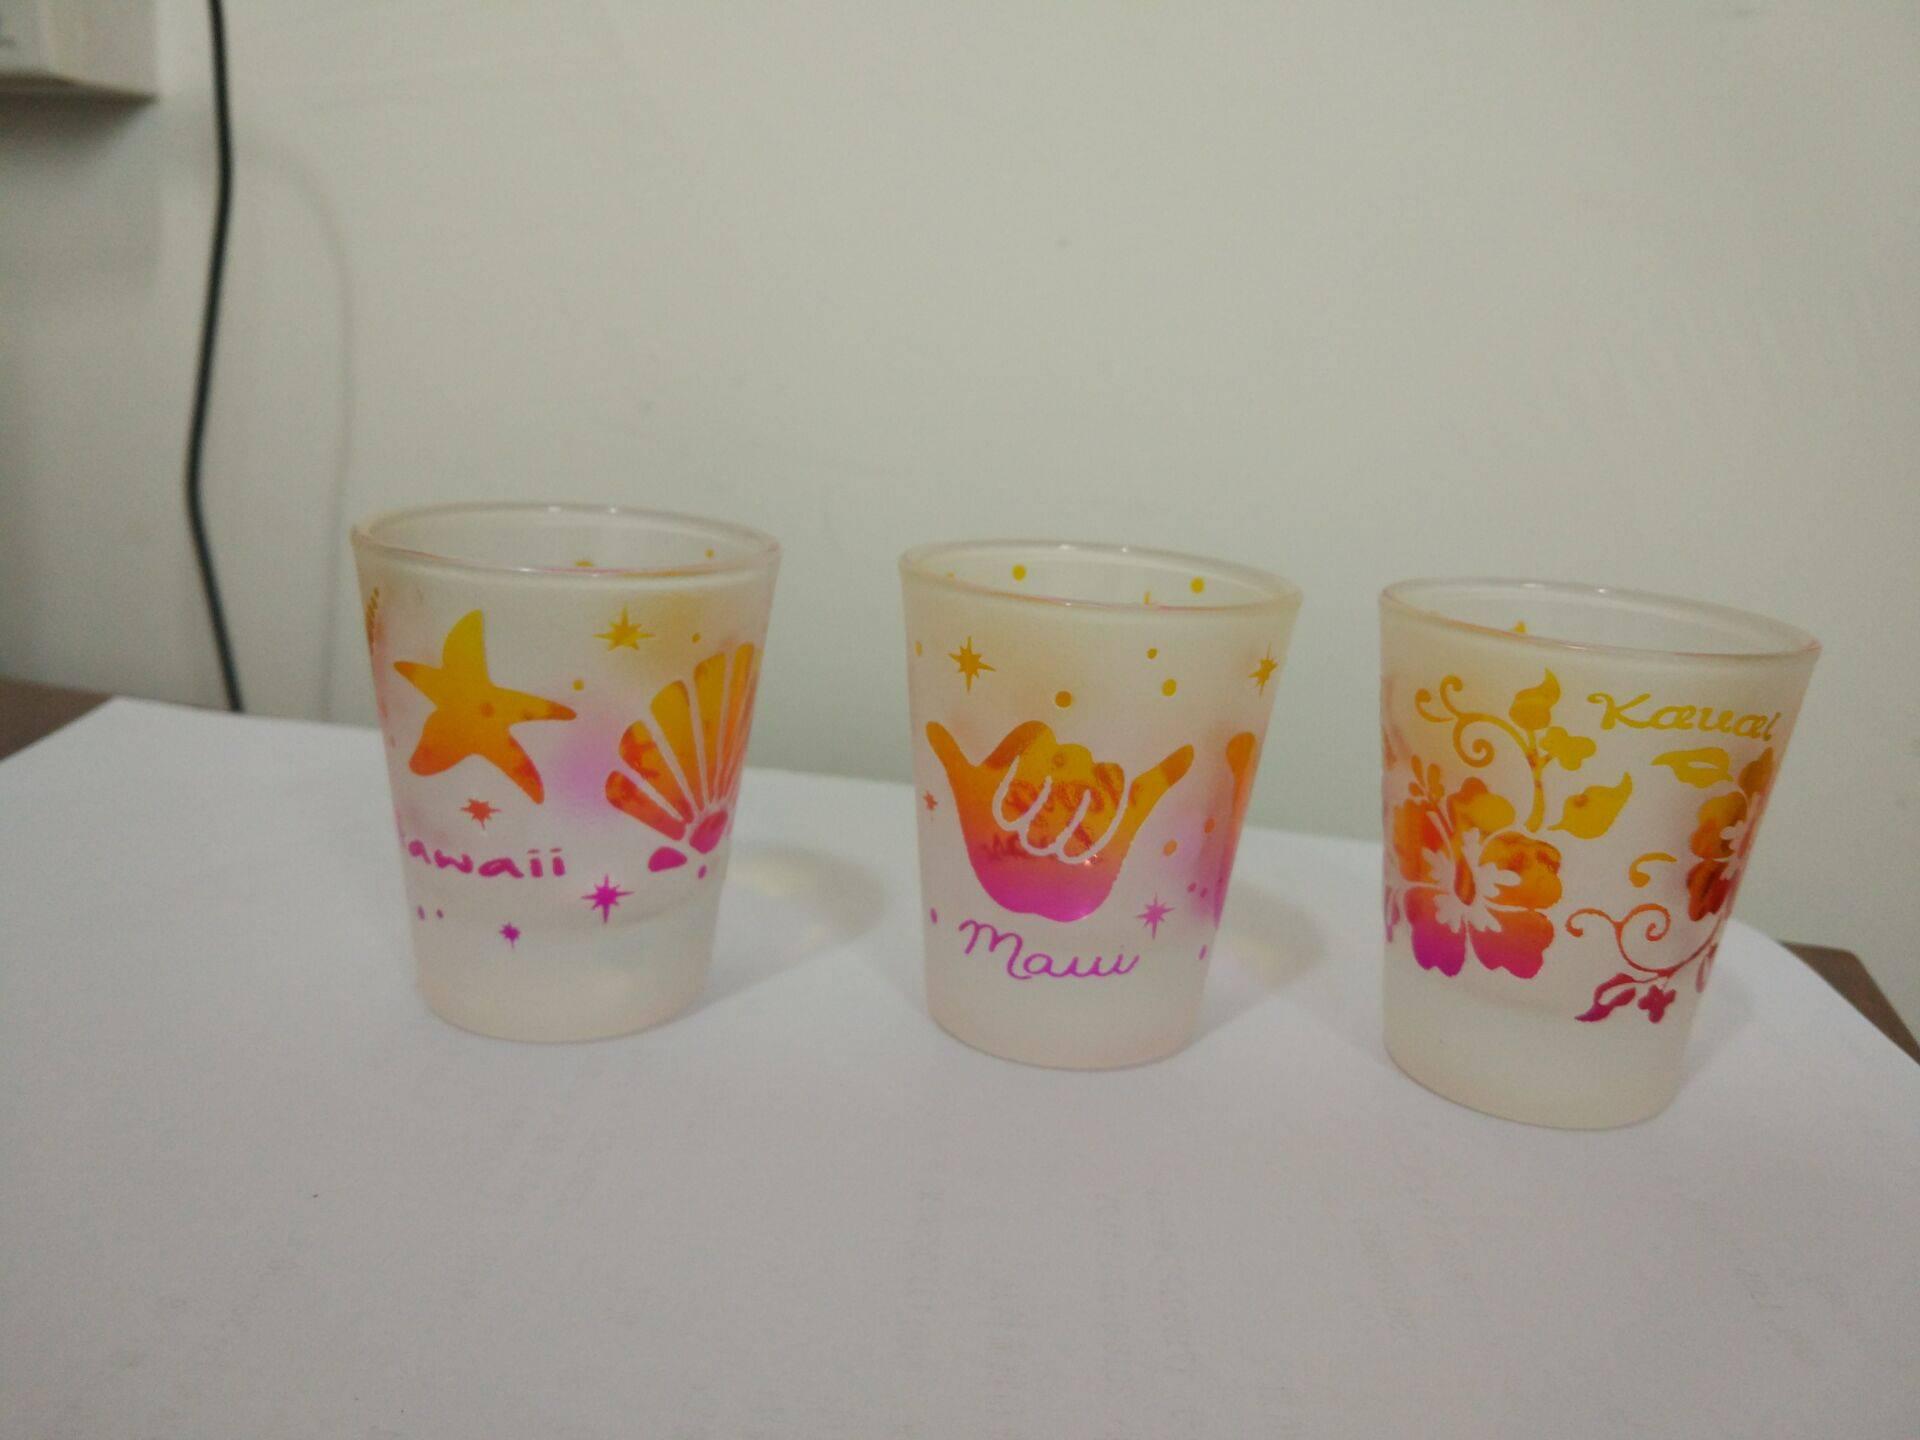 2oz Sandblast shot glass